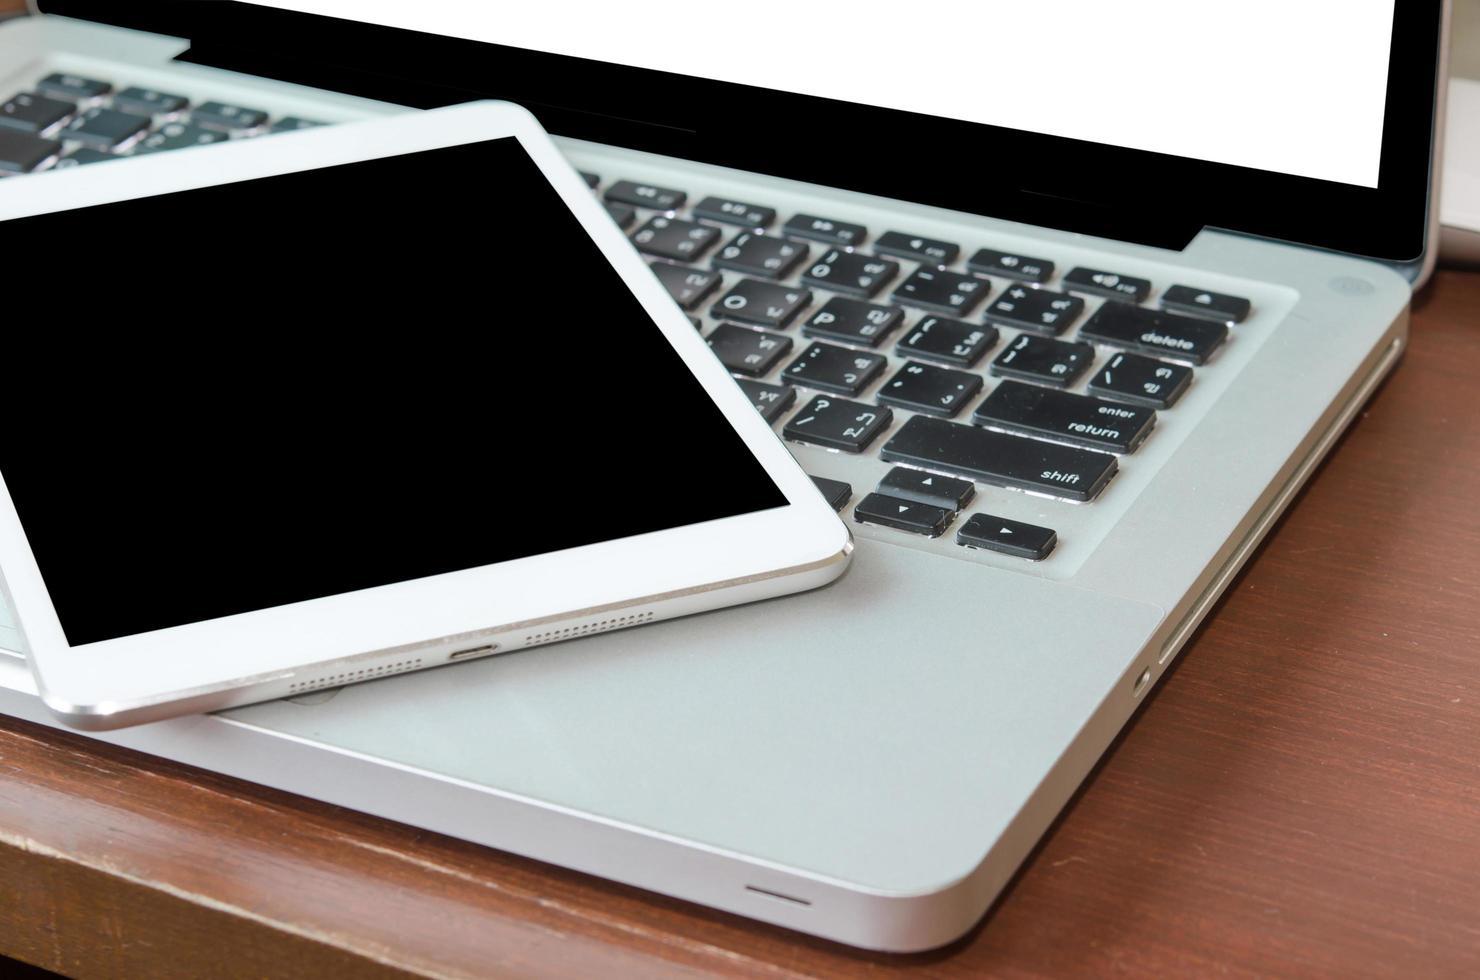 Blank screen tablet on laptop photo